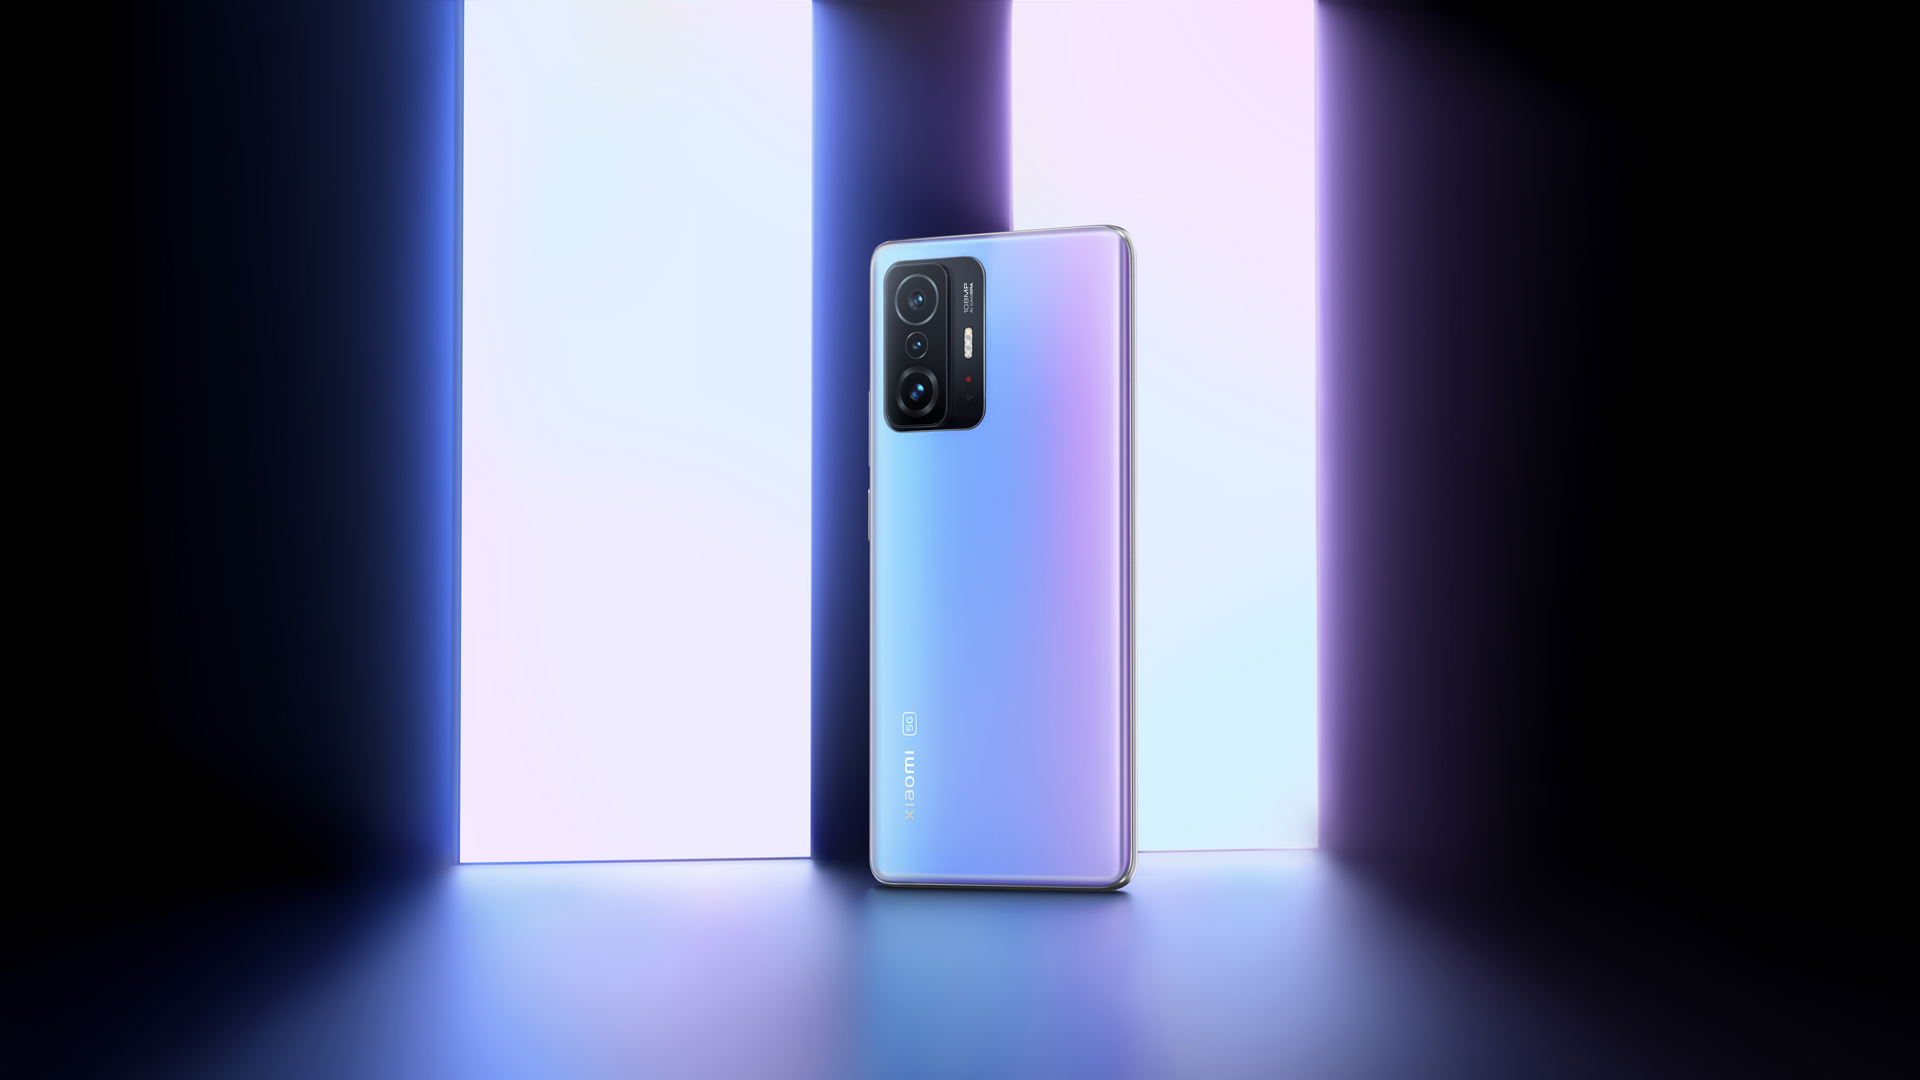 Das neue Xiaomi 11T Pro 5G in Celestial Blue.